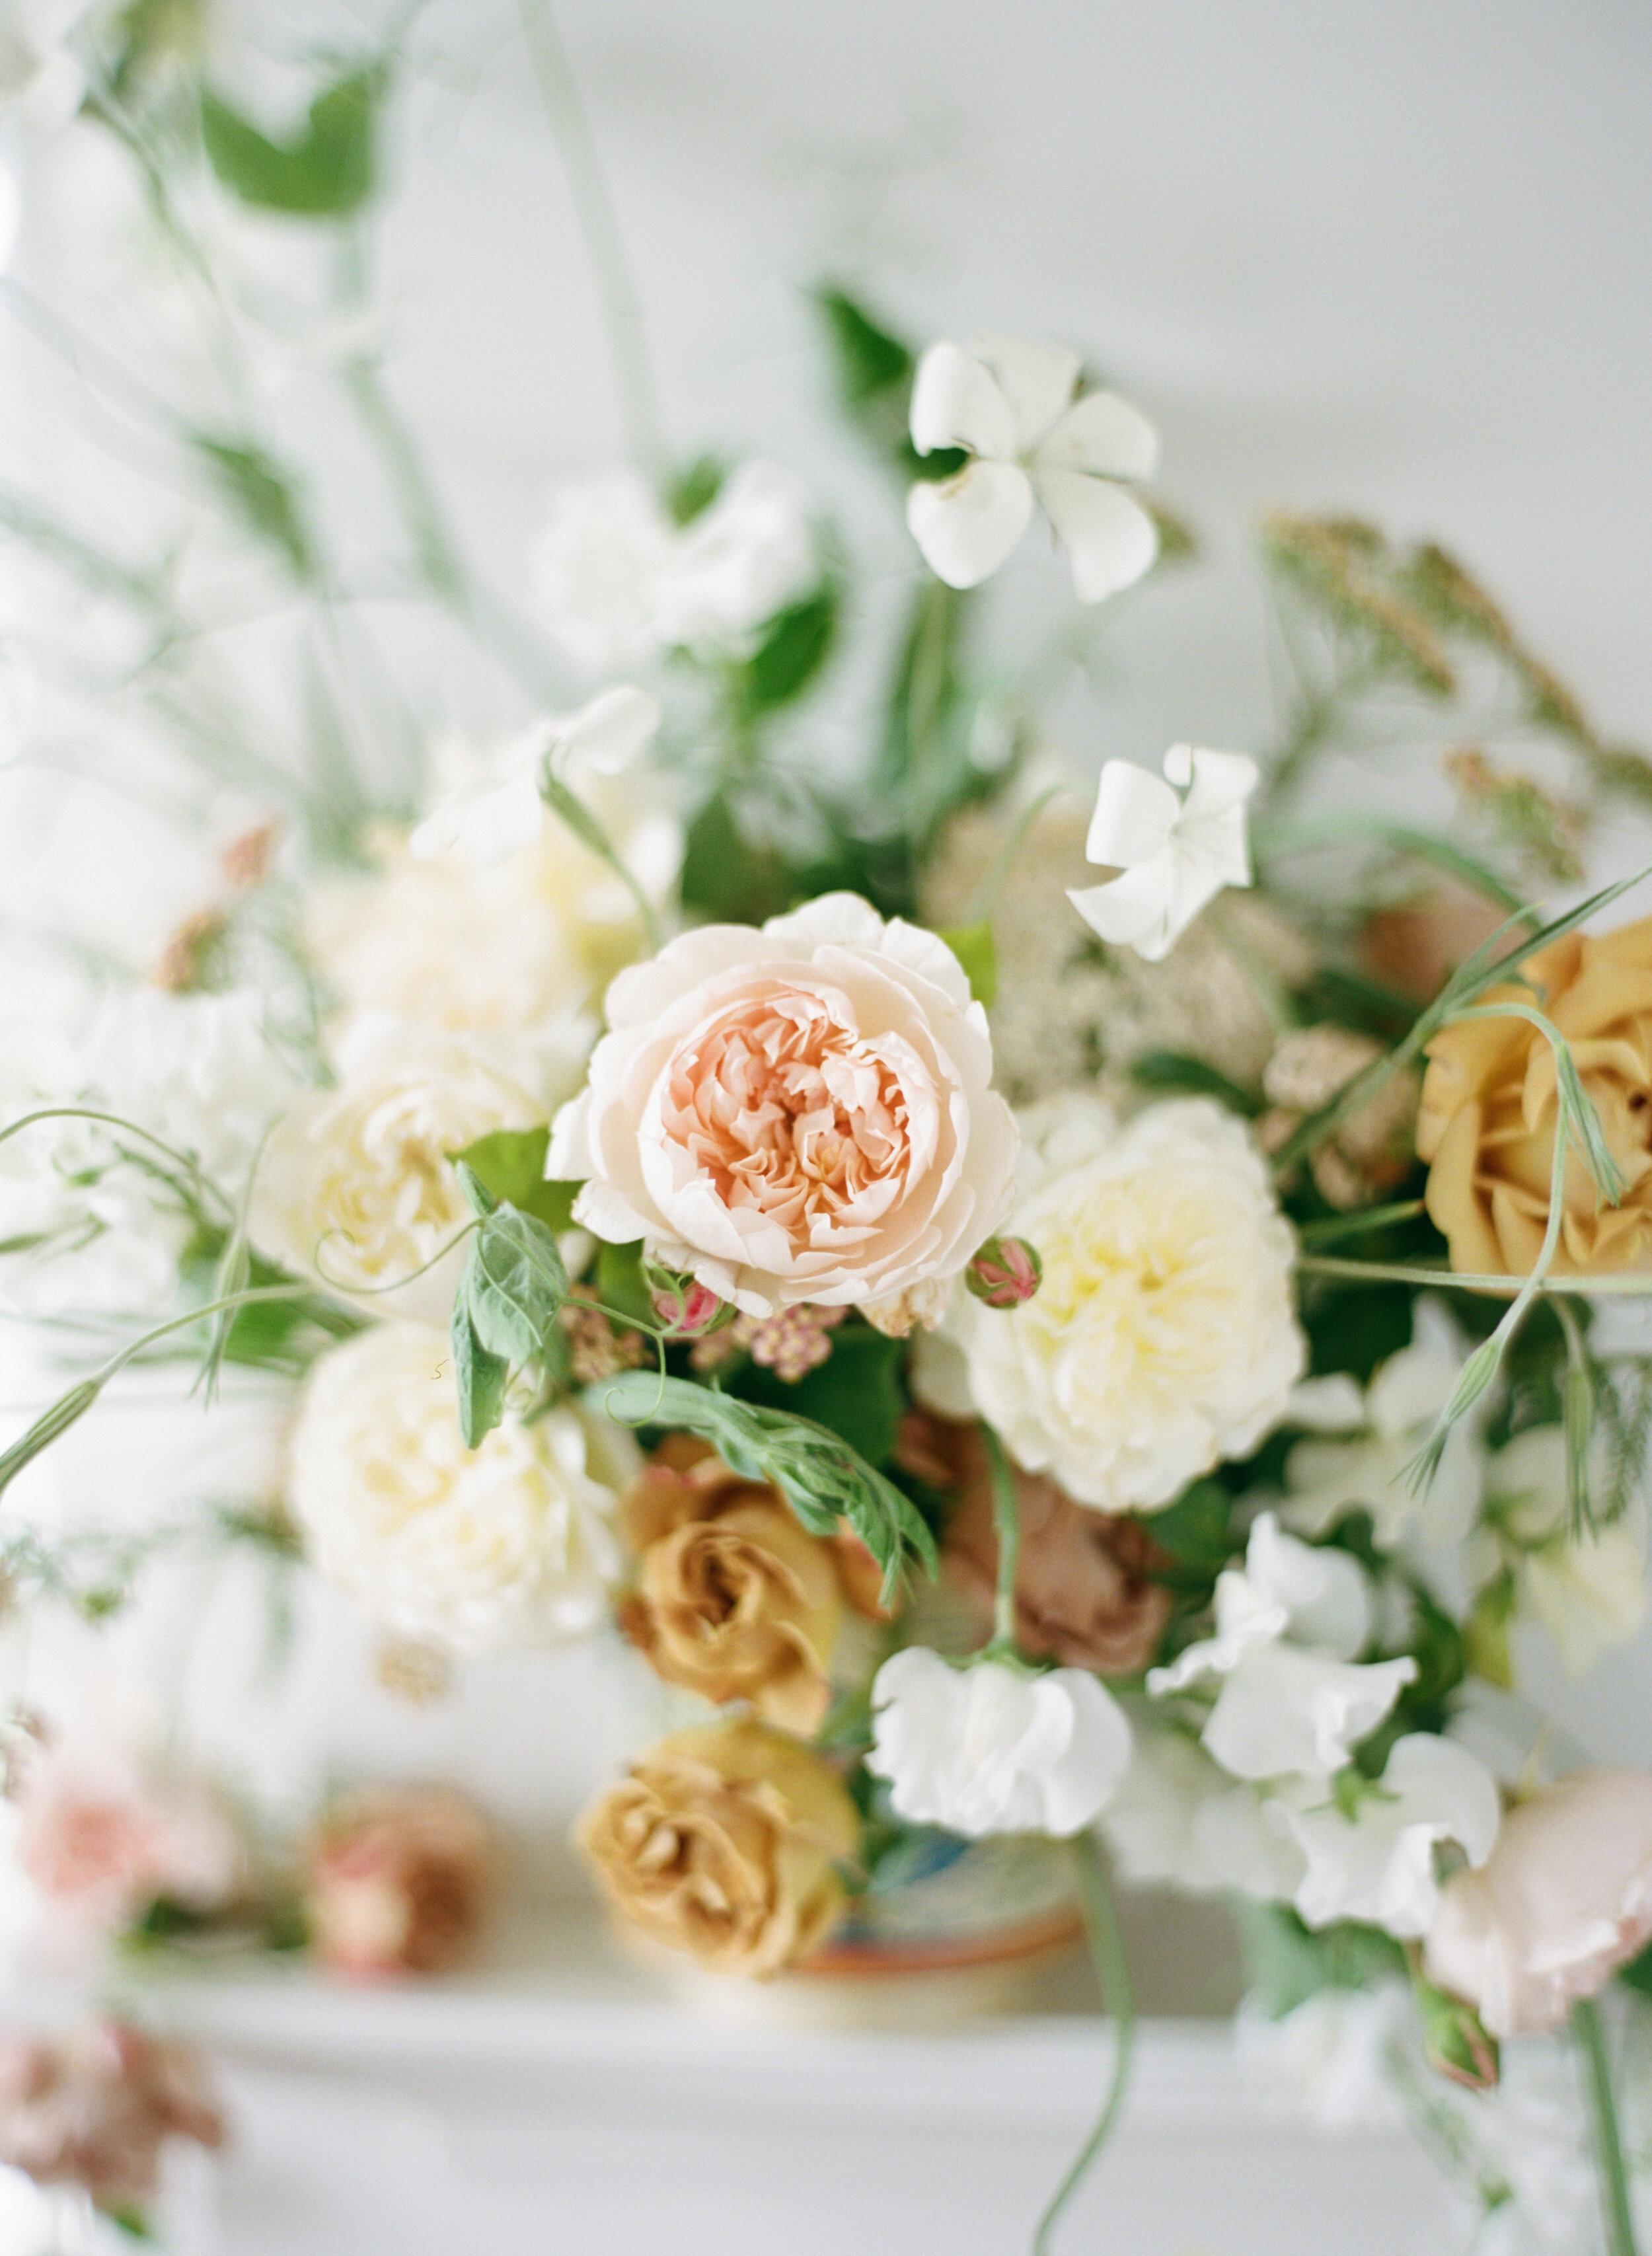 alexandra-meseke-understated-soft-luxury-wedding-upstate-ny_0031.jpg